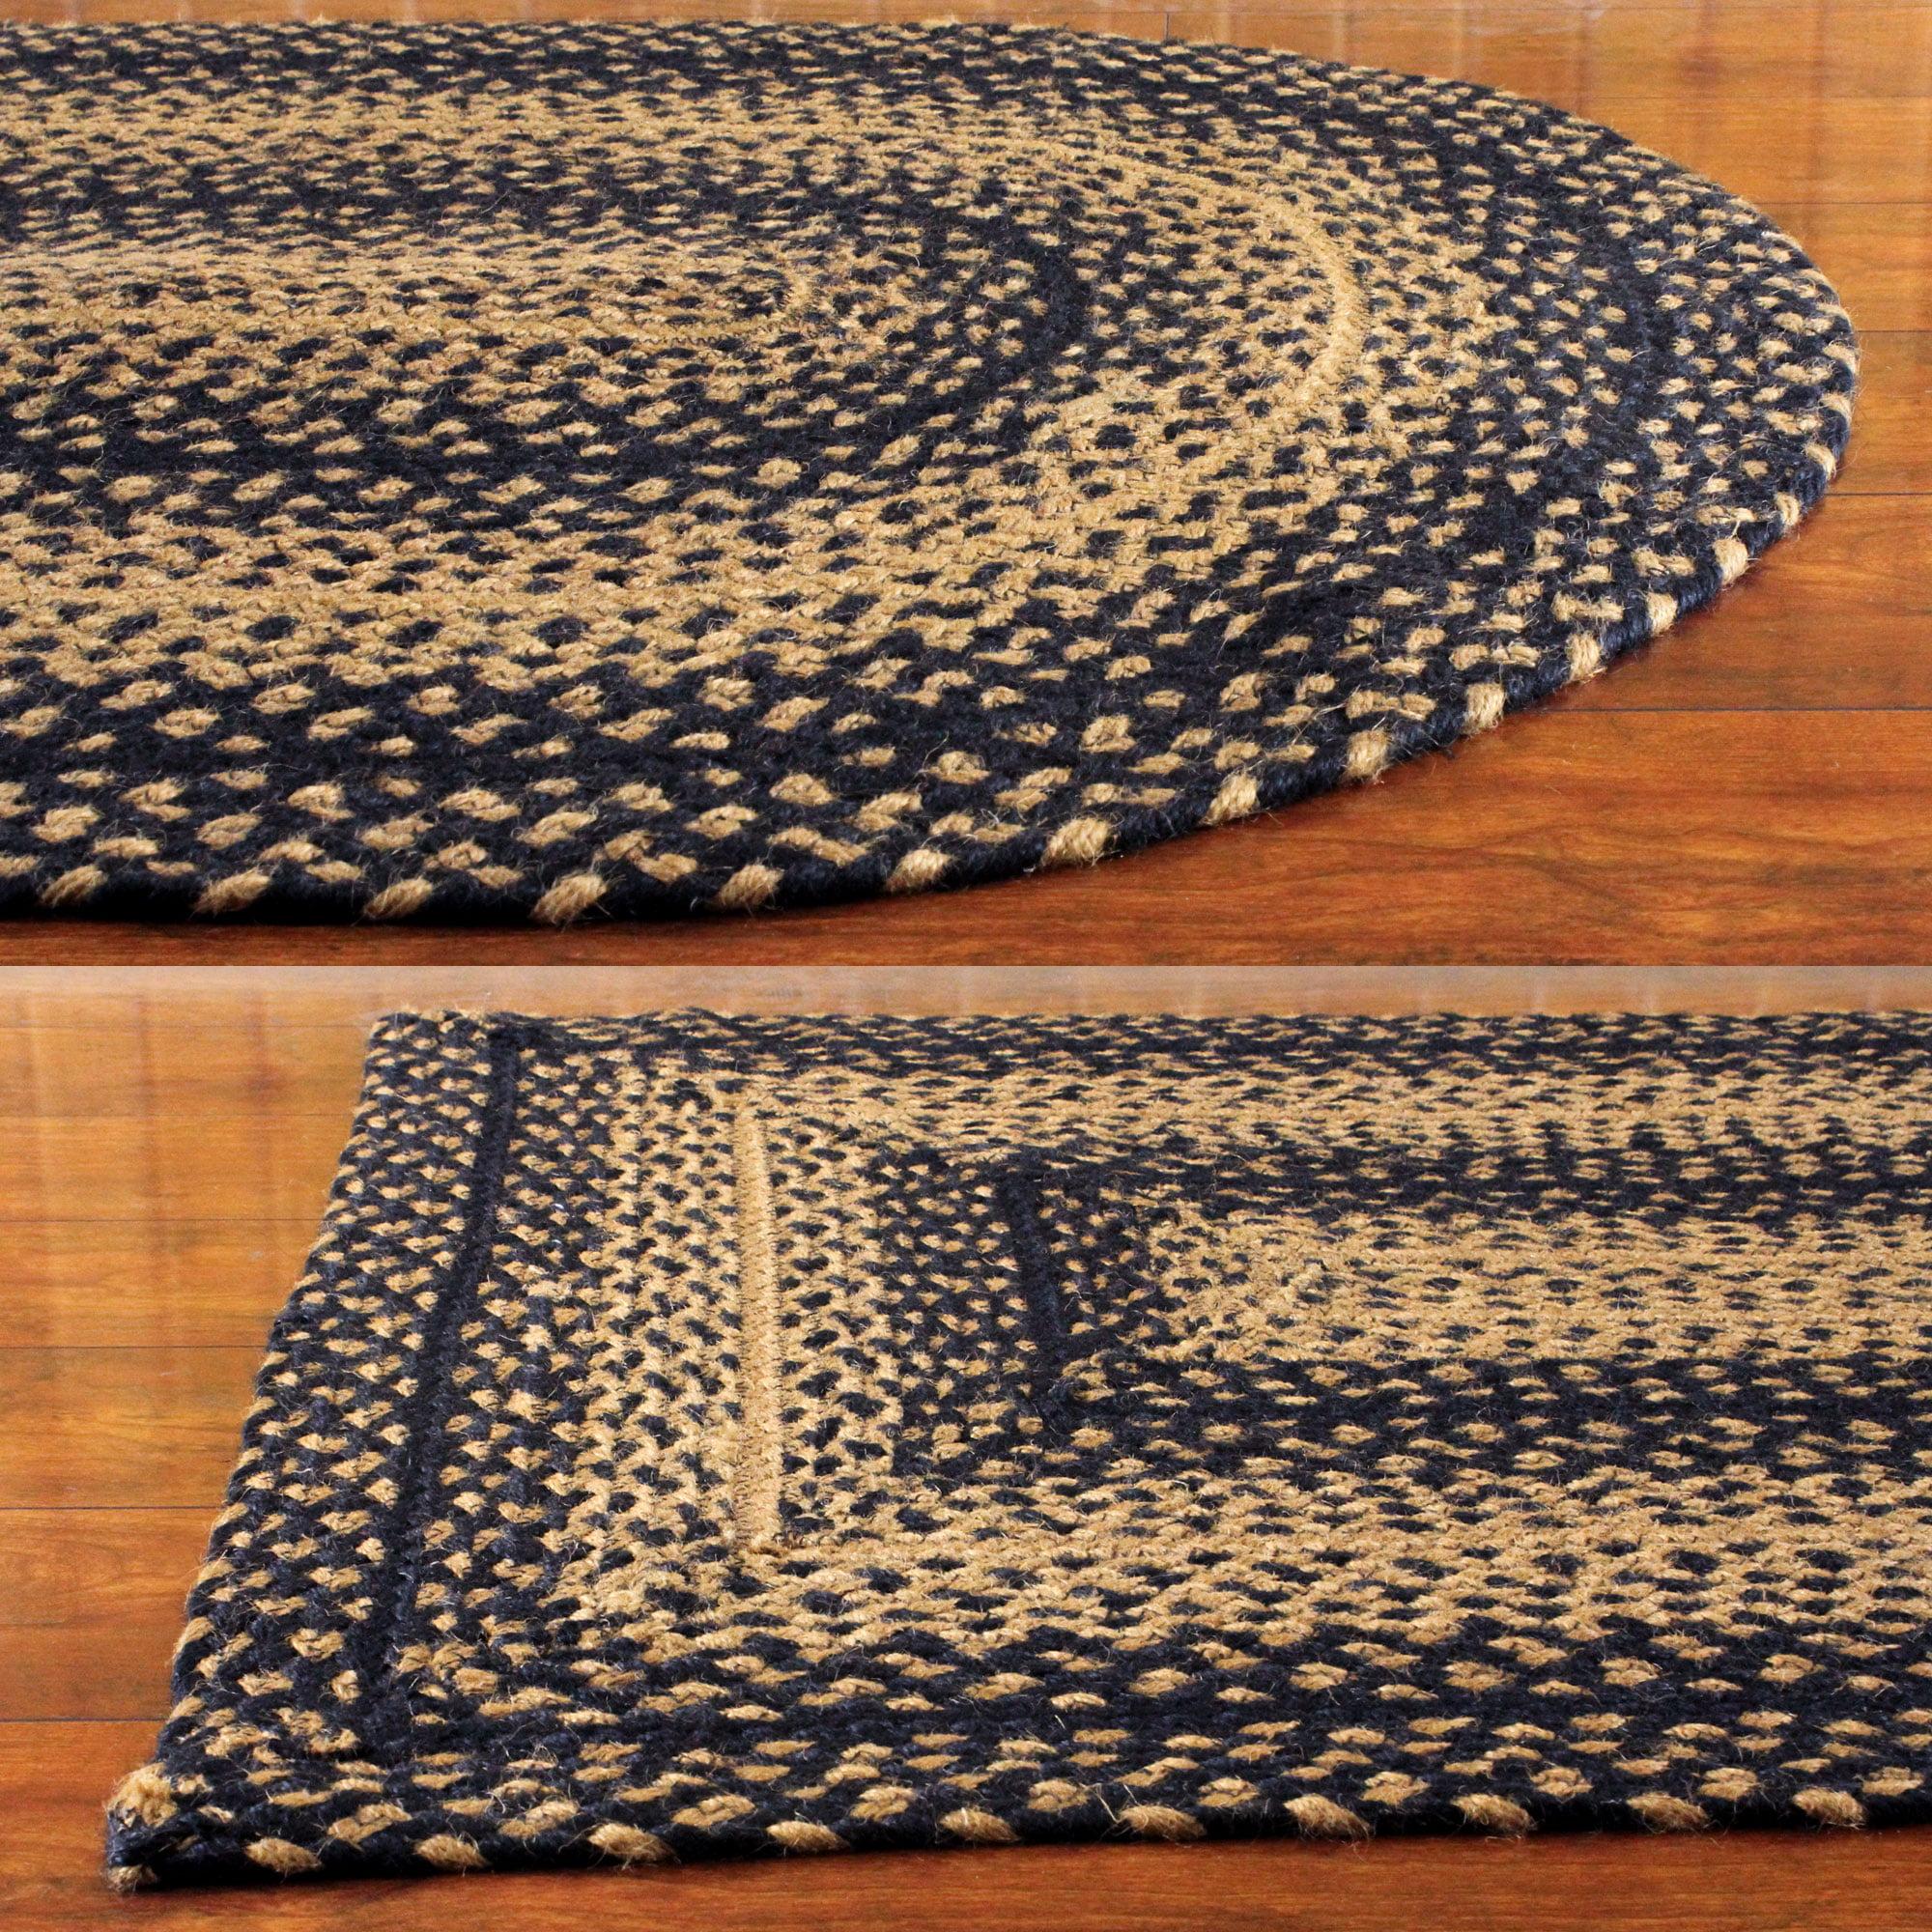 Tan Rectangle Braided Area Rug